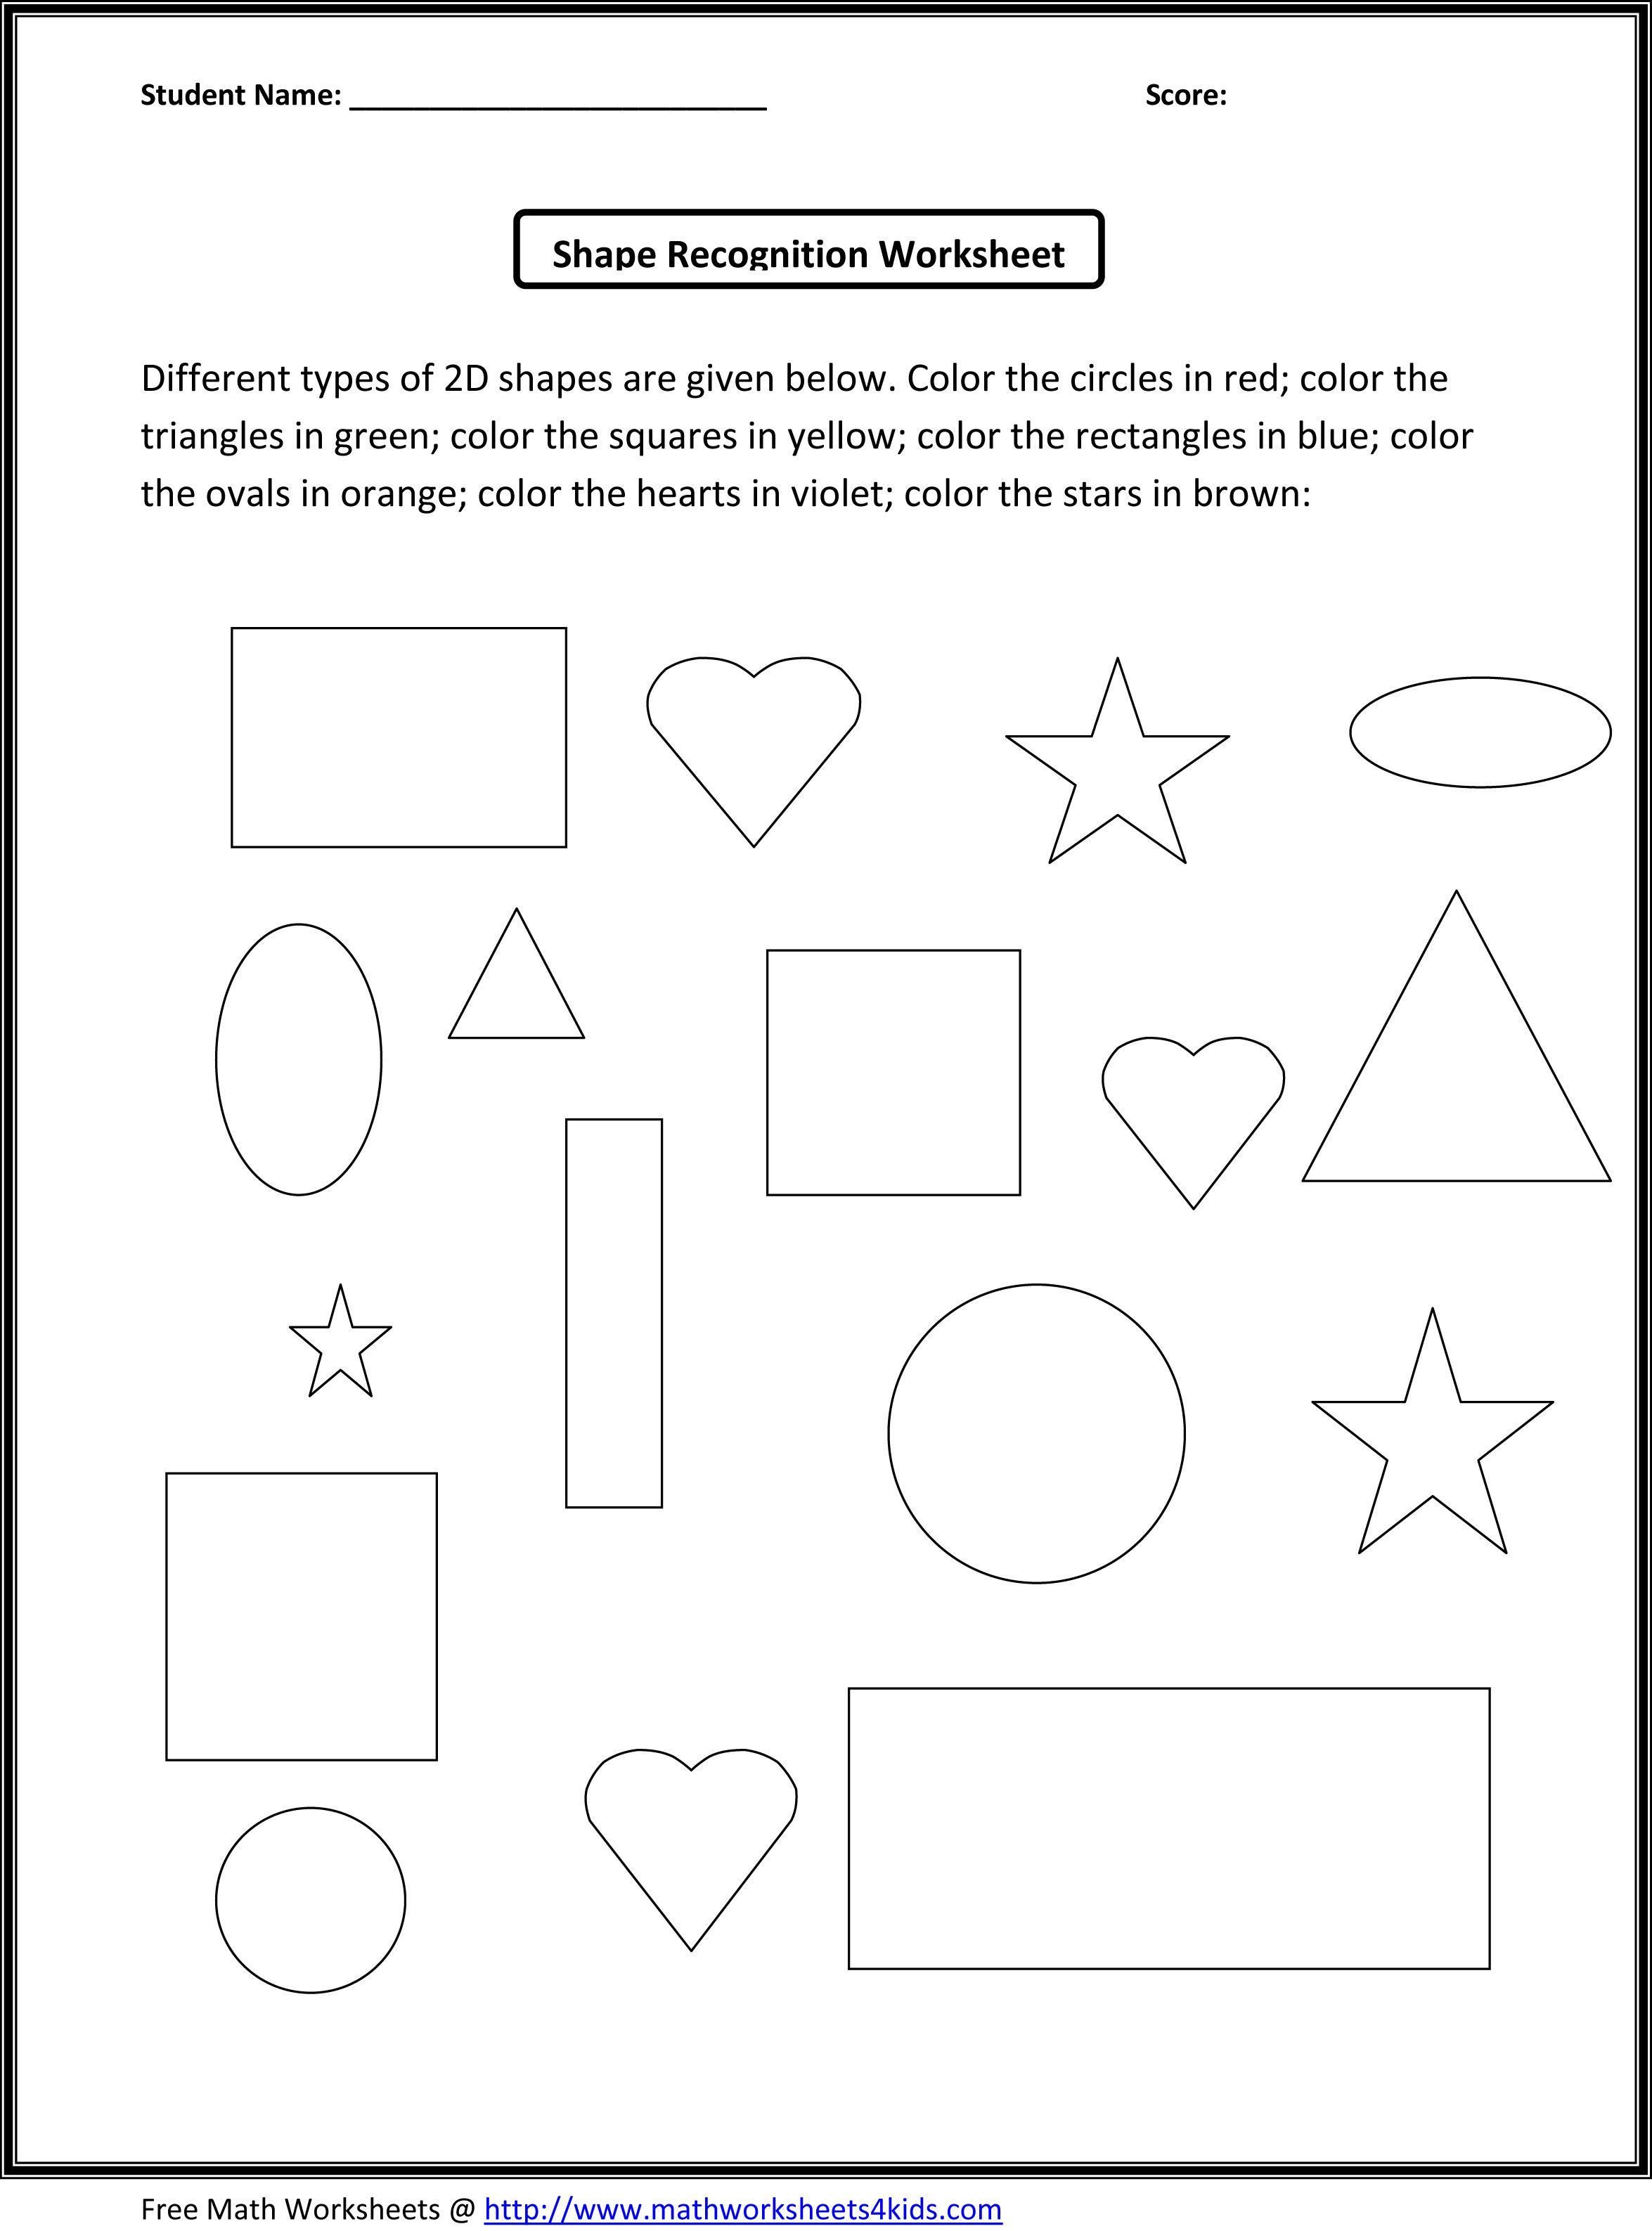 Spanish Worksheets For Kindergarten Money This Section